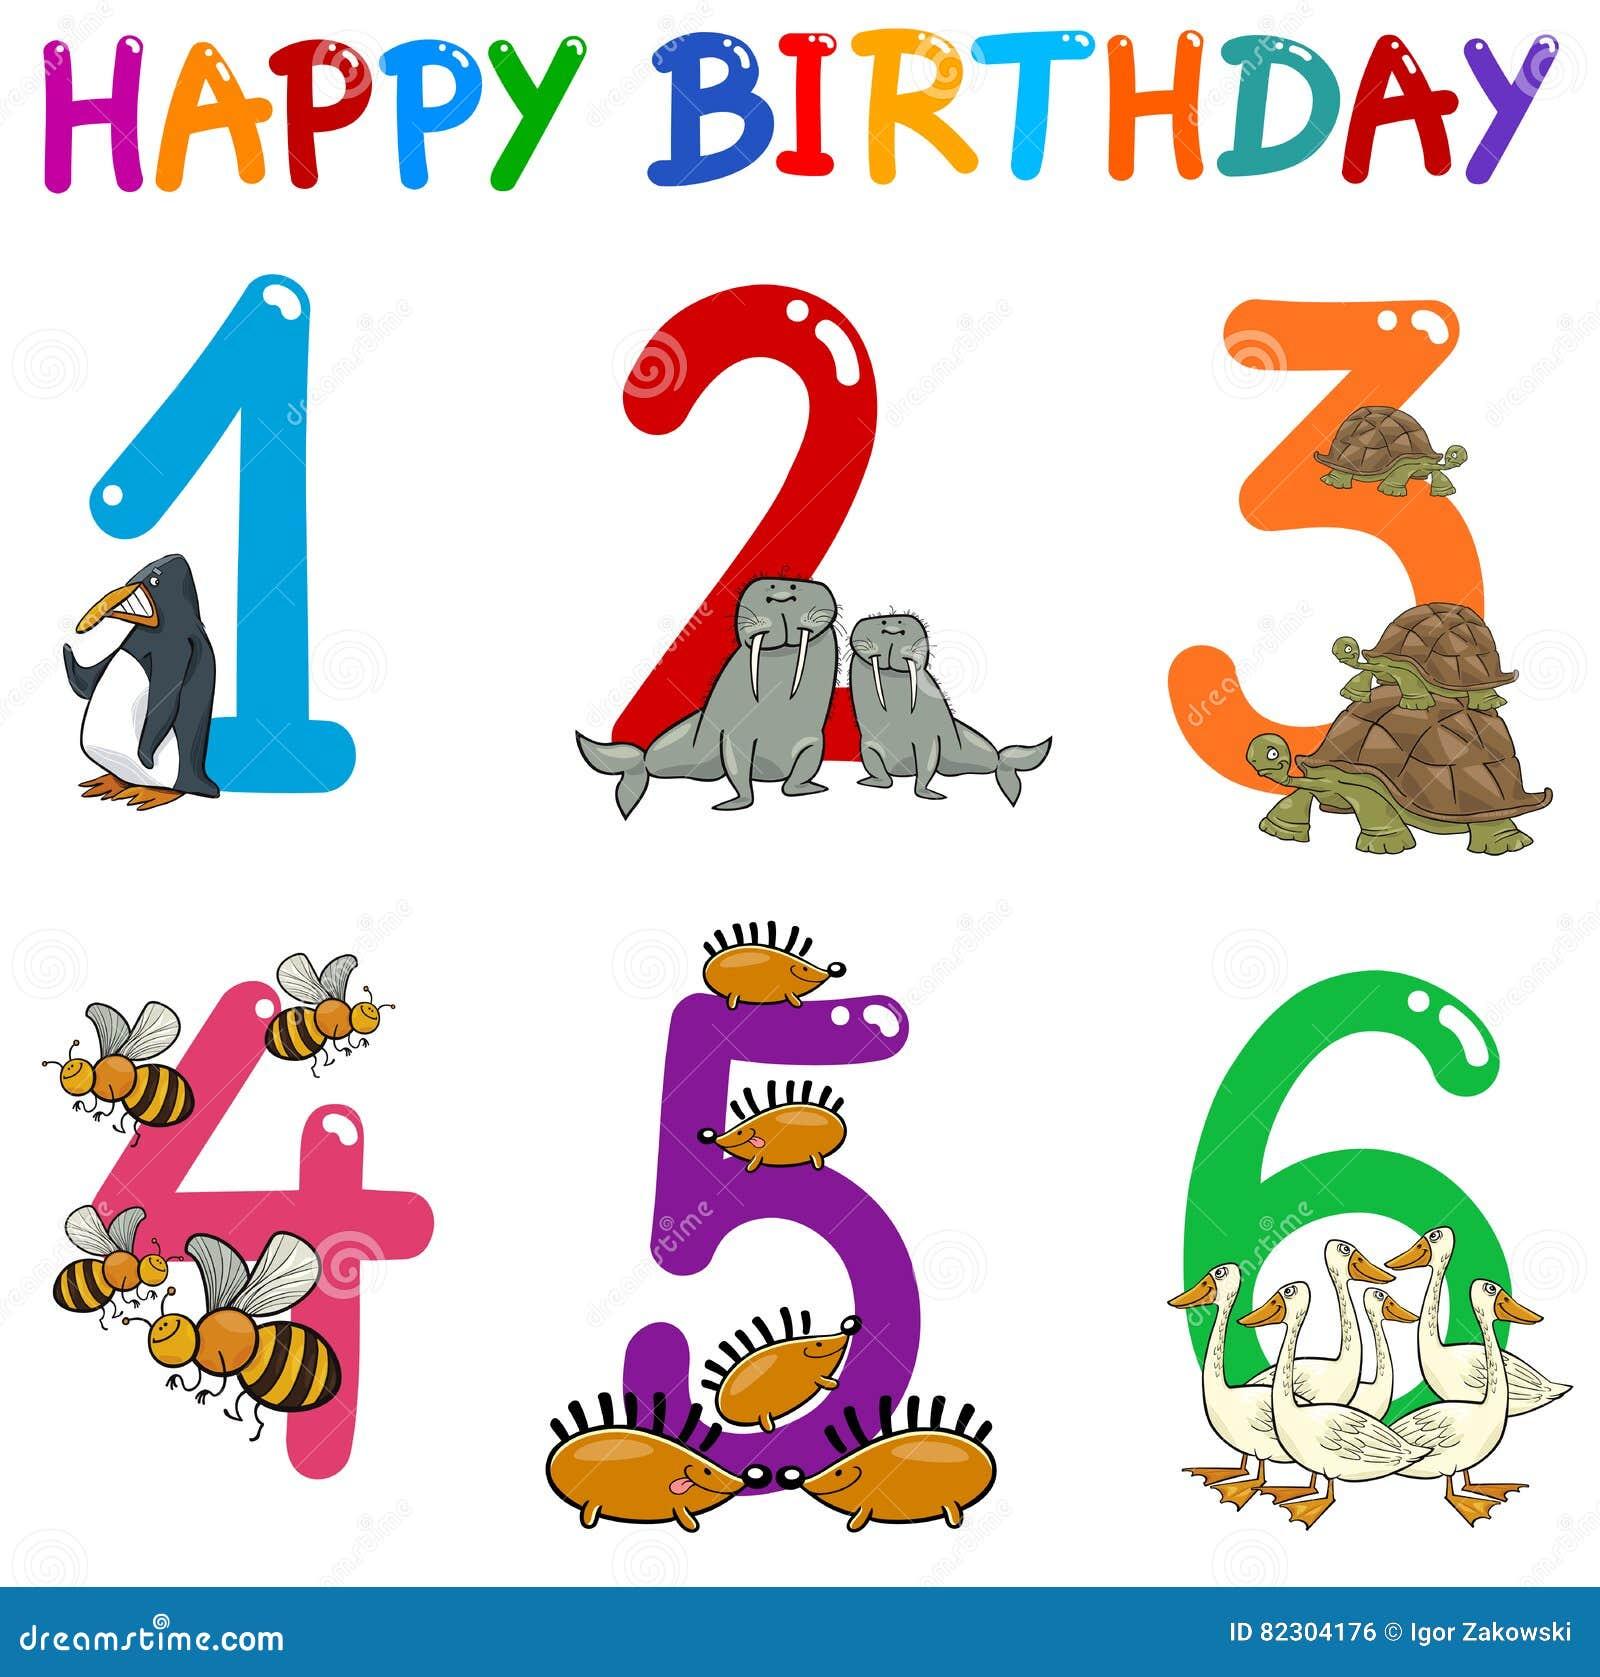 Birthday greeting cards stock vector illustration of second 82304176 download birthday greeting cards stock vector illustration of second 82304176 m4hsunfo